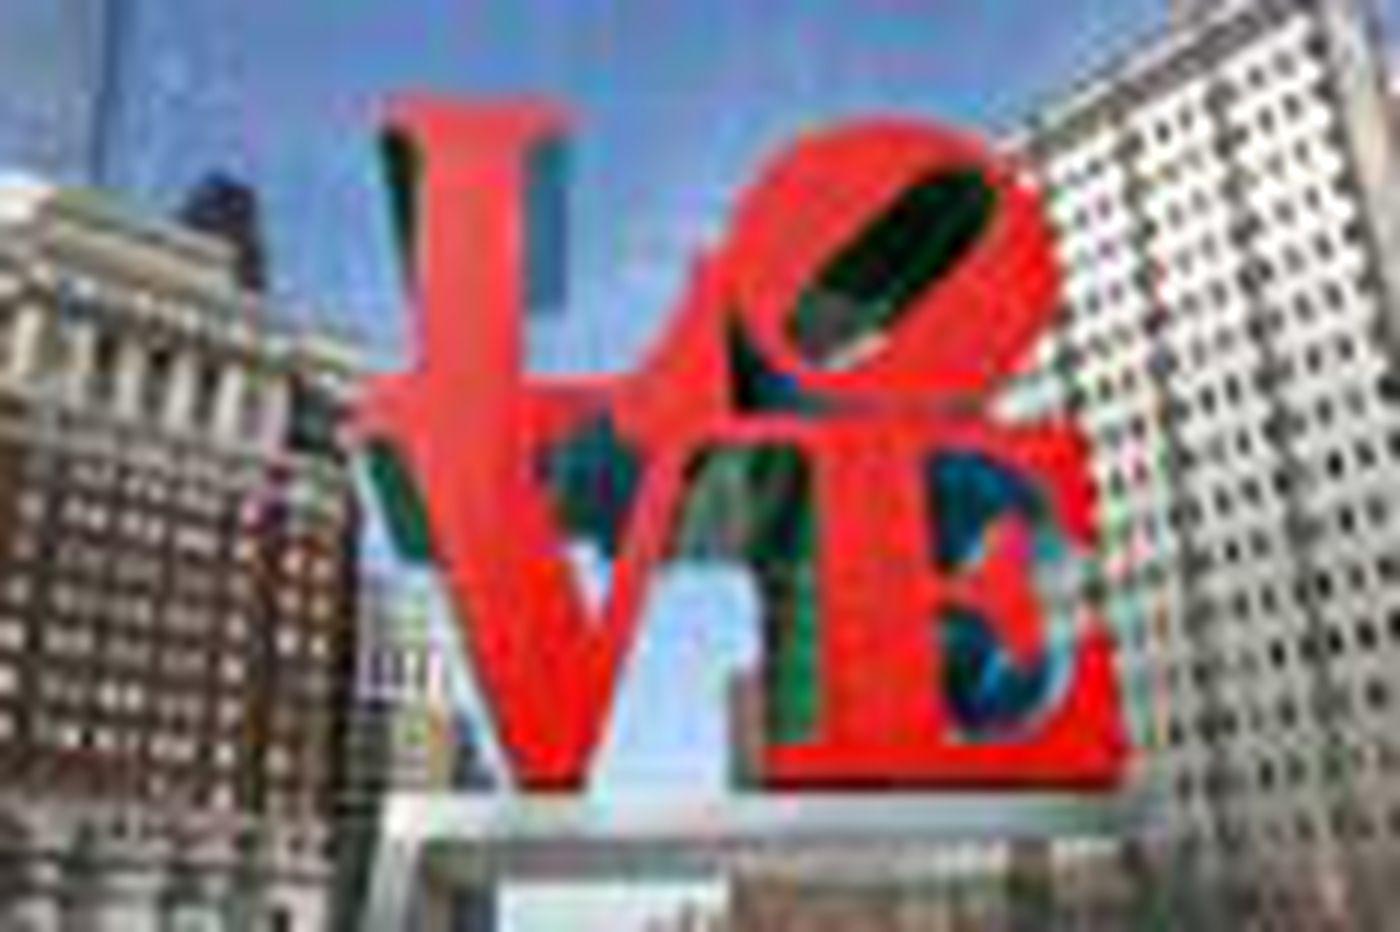 Flash-mob threat forces shutdown of LOVE Park